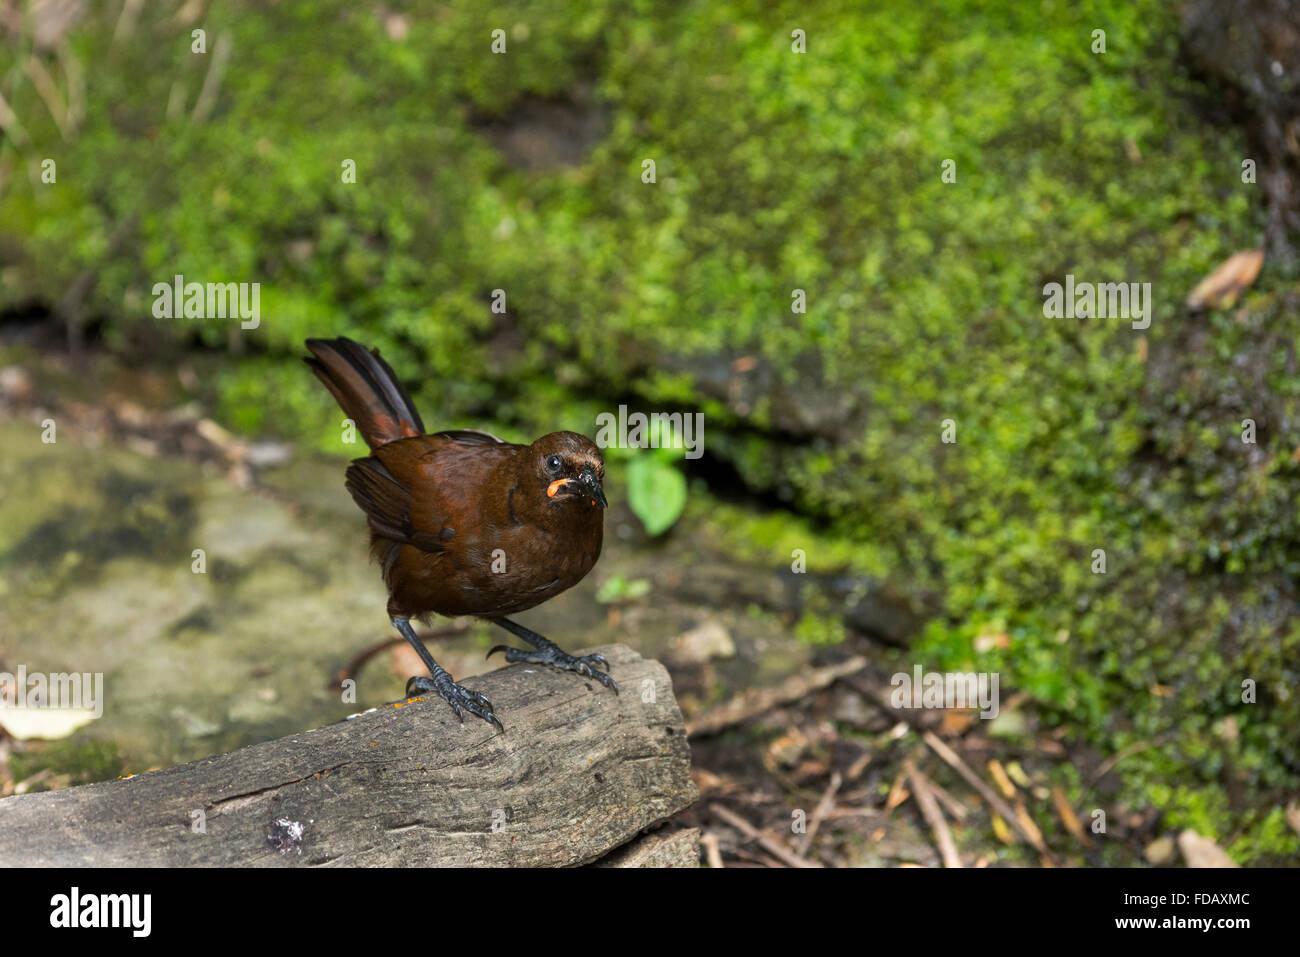 New Zealand, Marlborough Sounds, Queen Charlotte Sound, Motuara Island. This DOC-managed, predator-free island bird reserve. Stock Photo